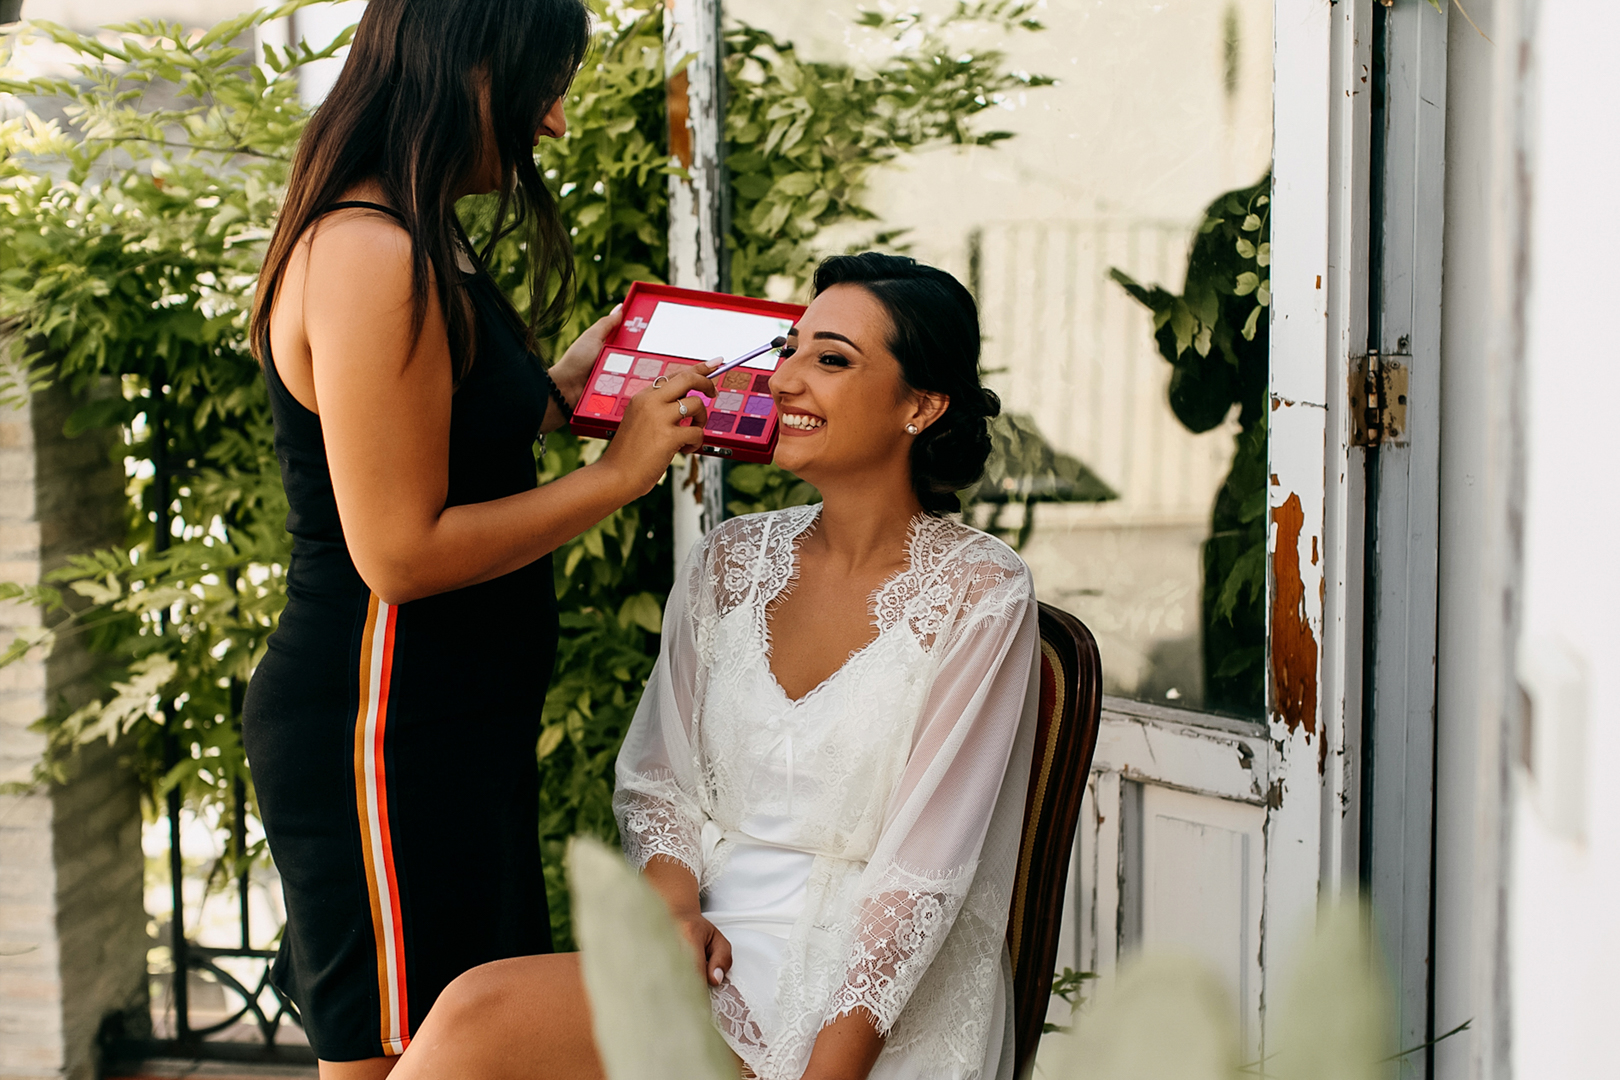 15 gianni-lepore-trucco-sposa-bride-getting-ready